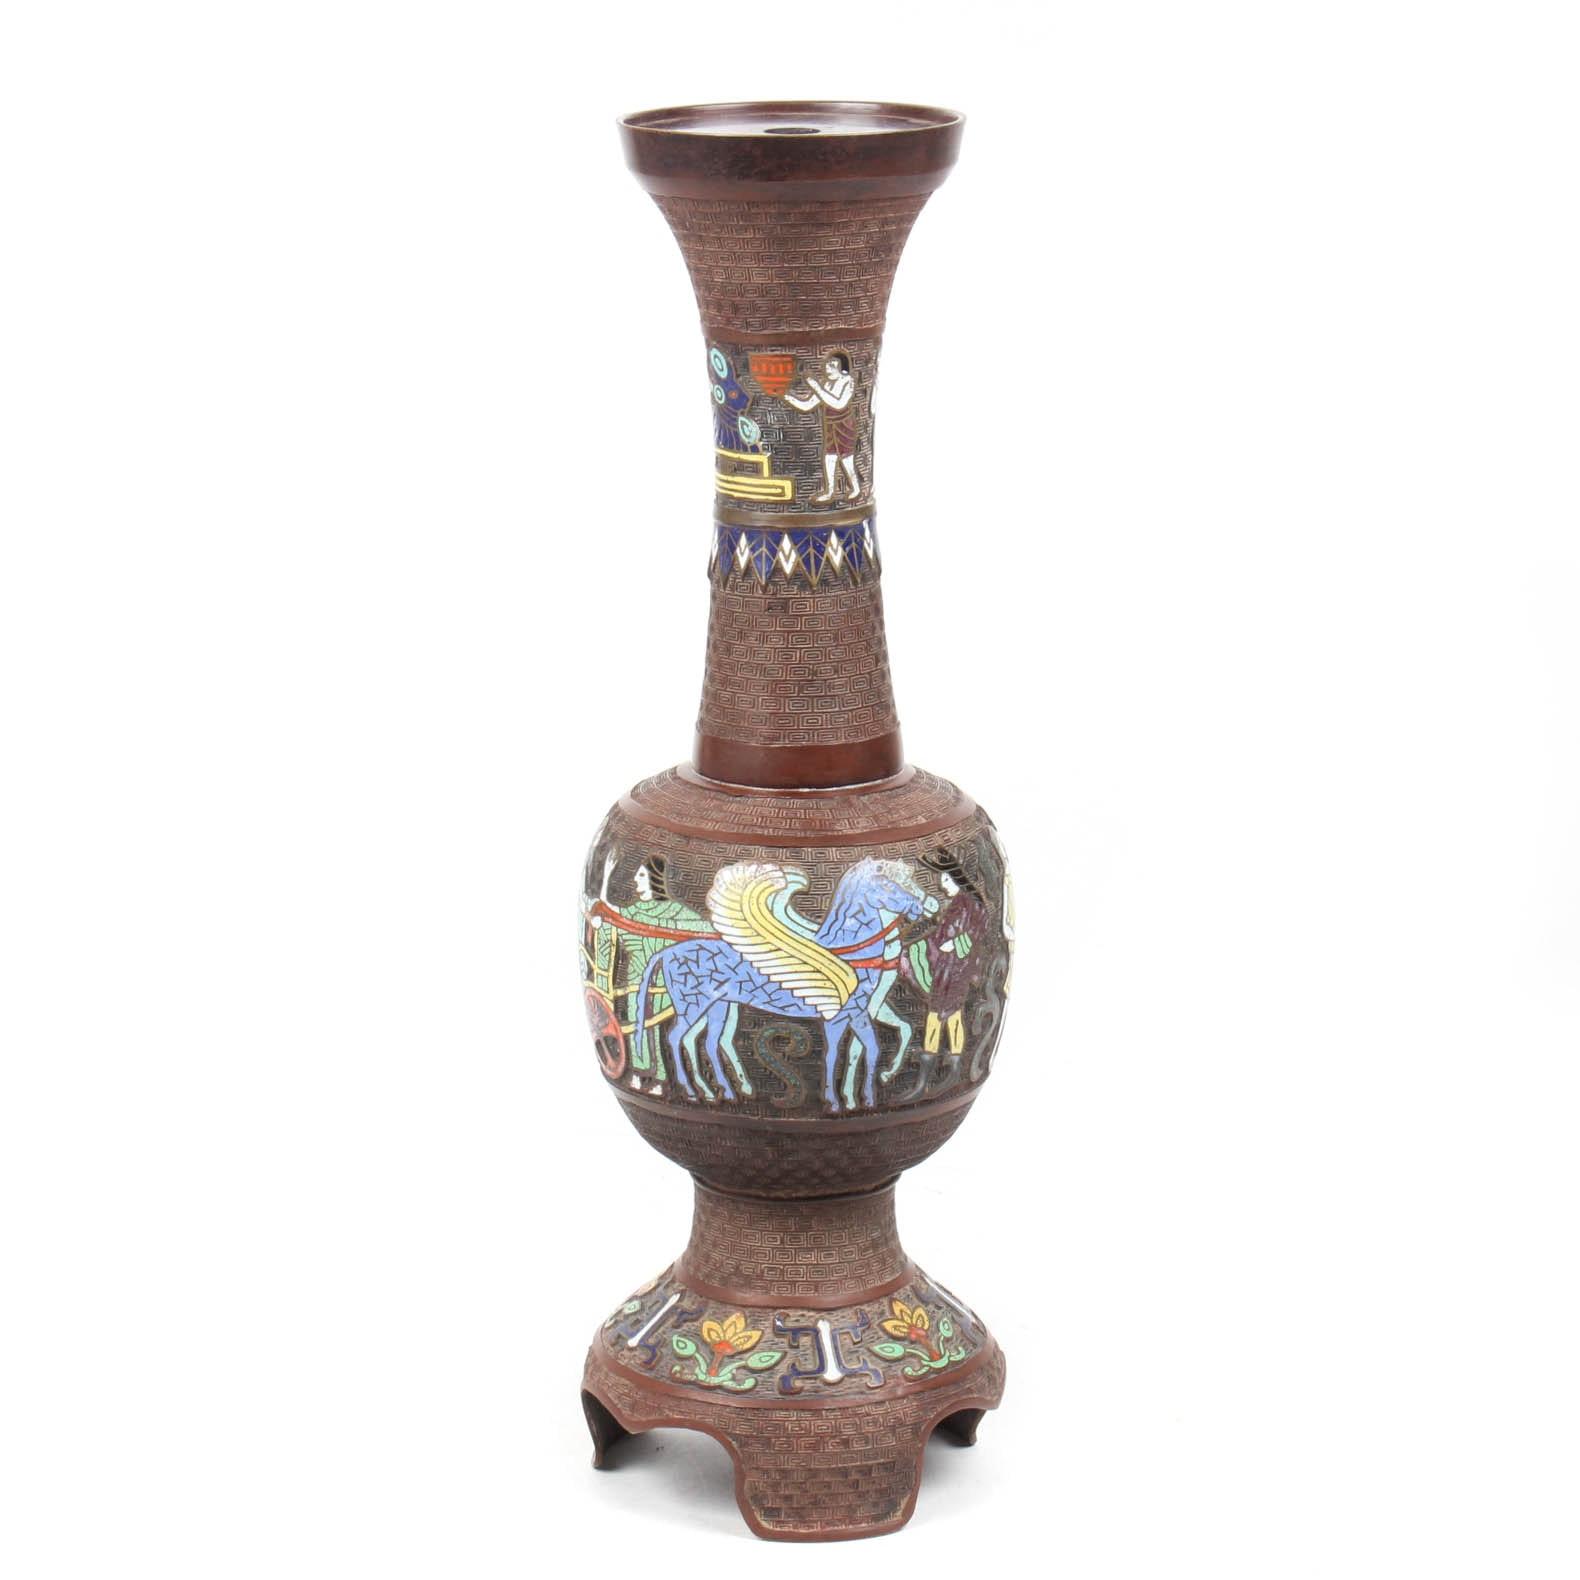 Vintage Persian Bronze and Enamel Lamp Base